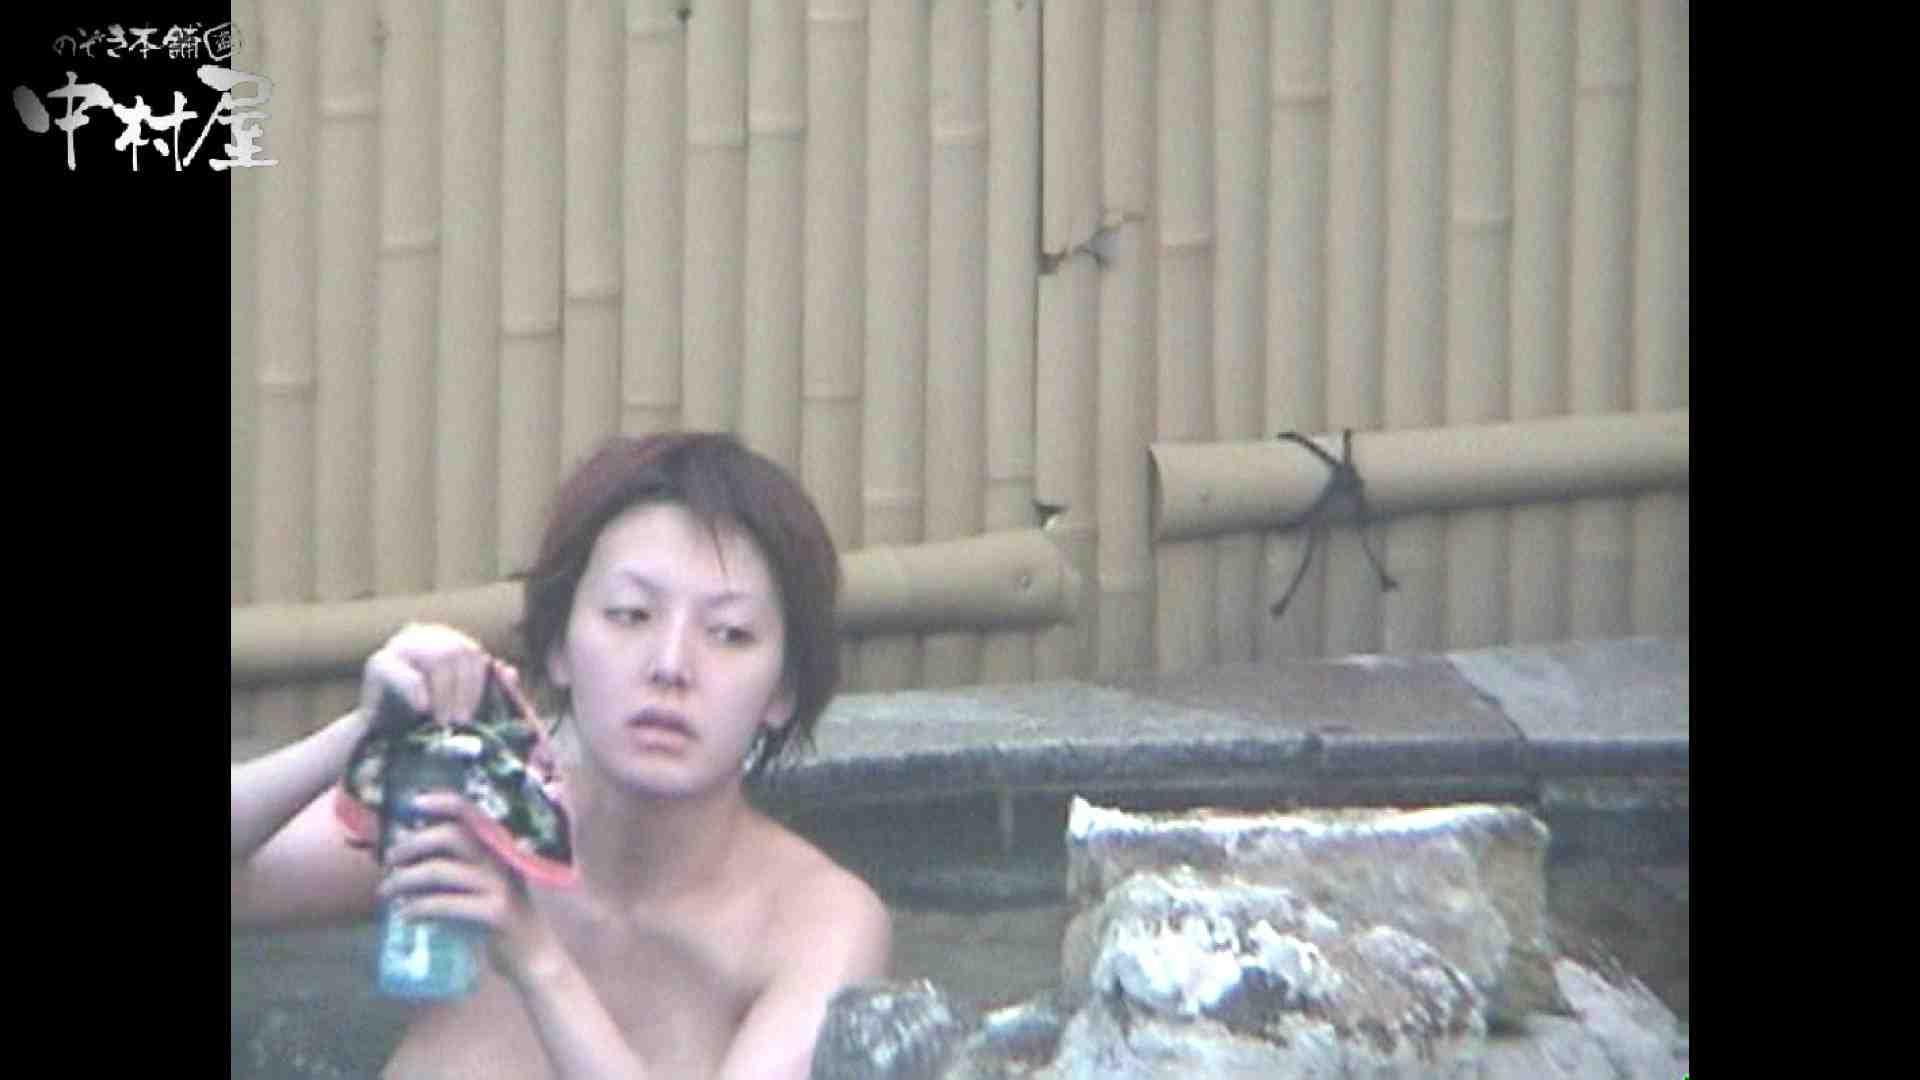 Aquaな露天風呂Vol.959 盗撮シリーズ | 露天風呂編  80PIX 23